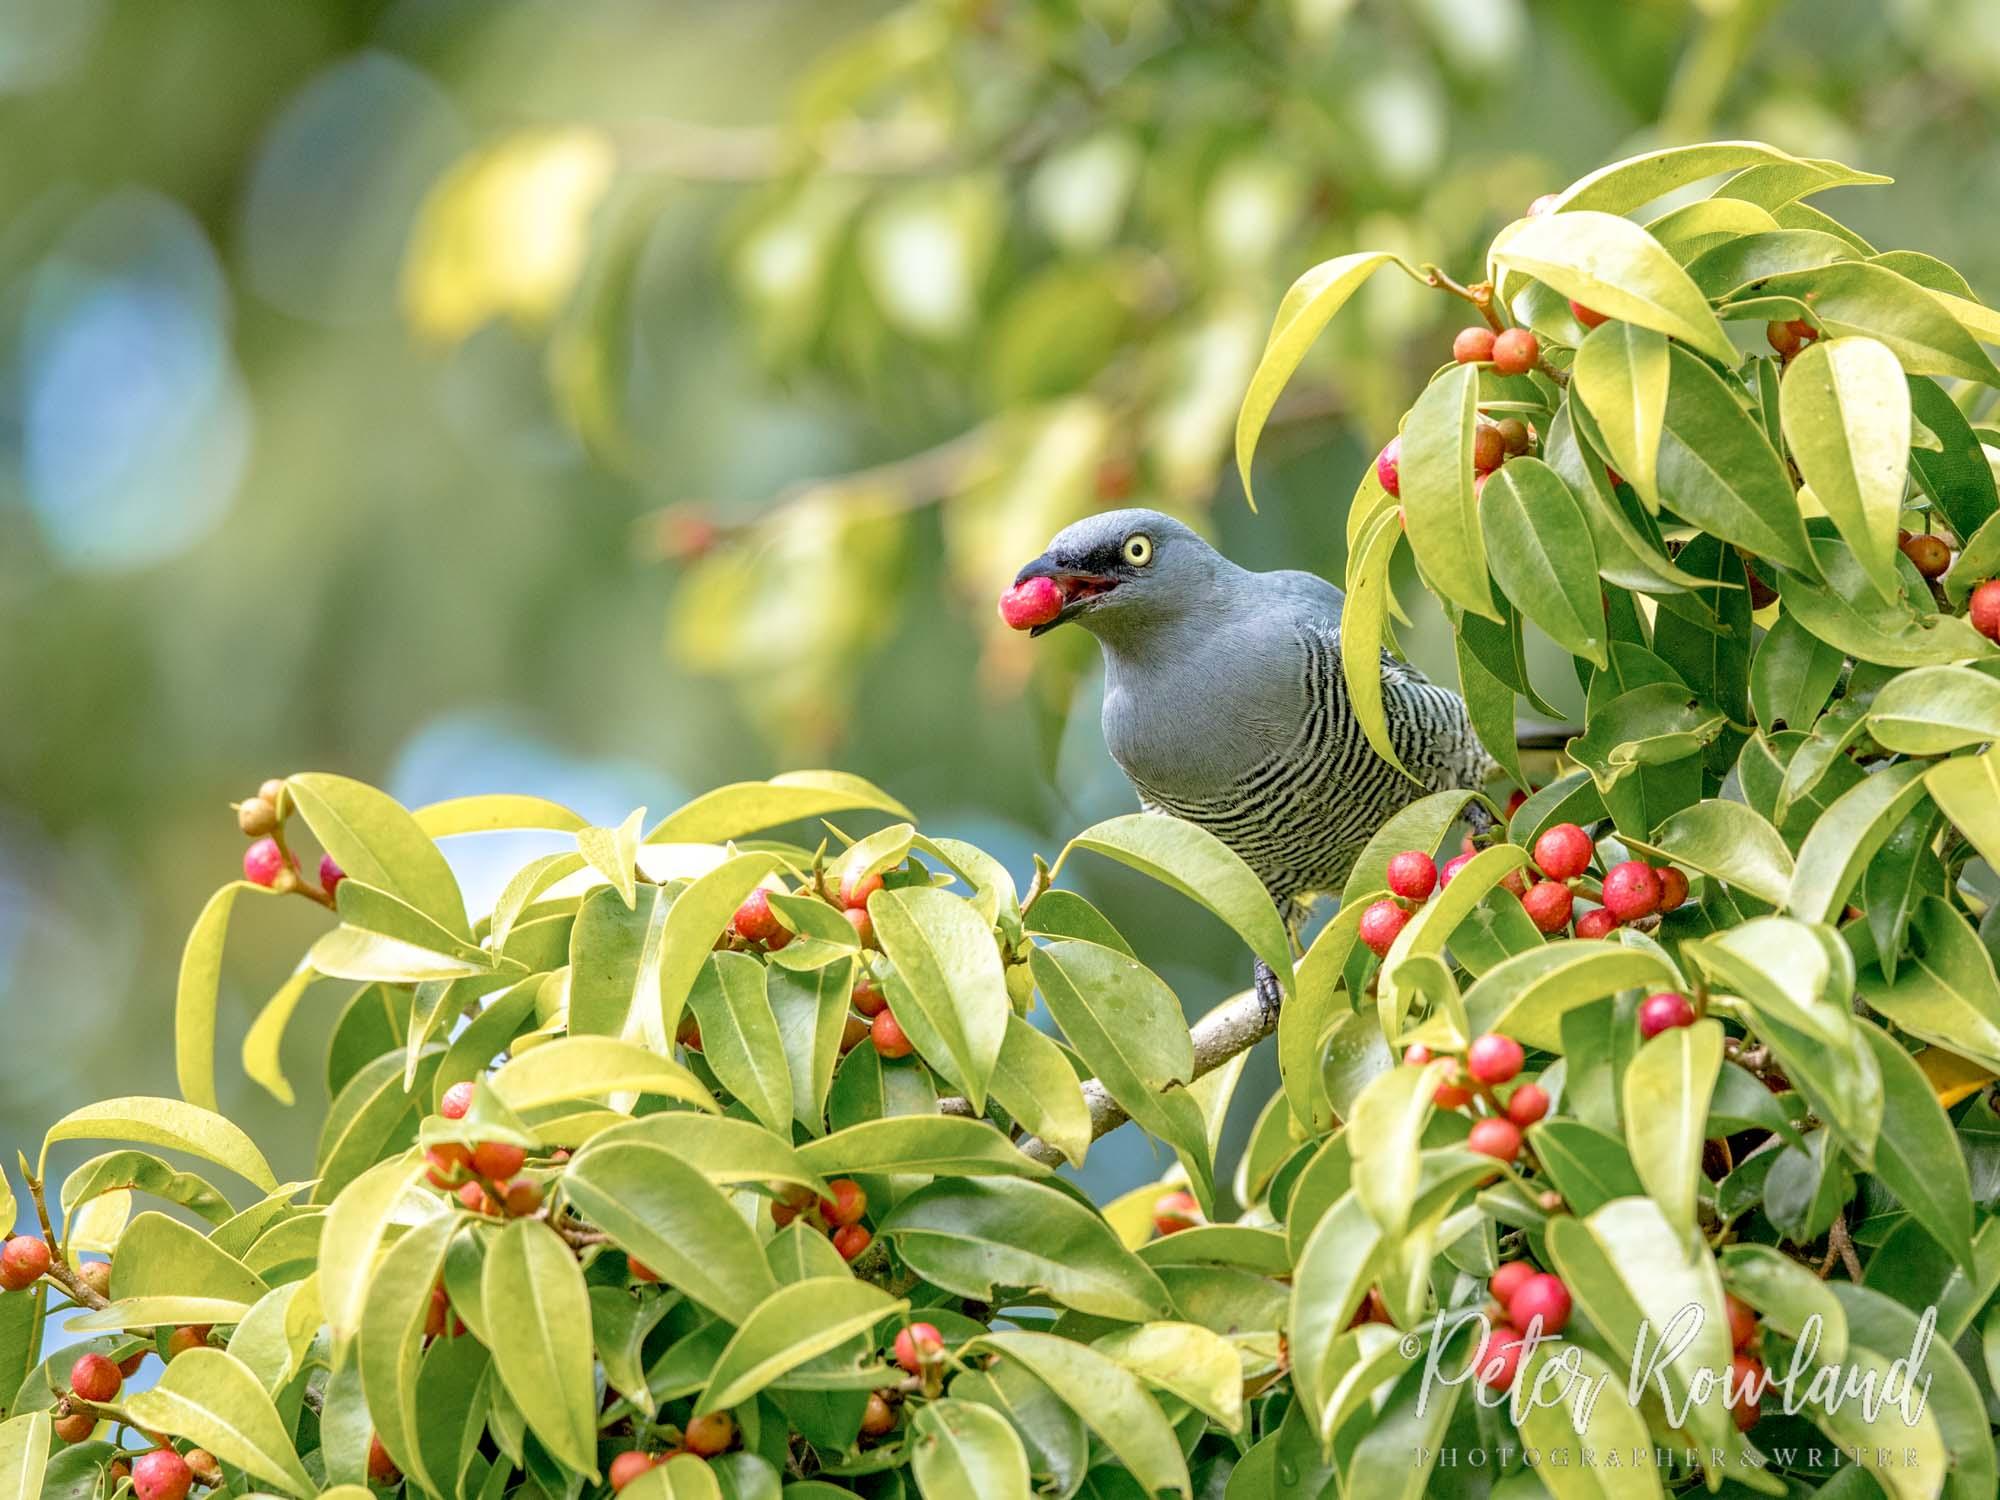 Barred Cuckoo-shrike feeding on red fruits of fig tree